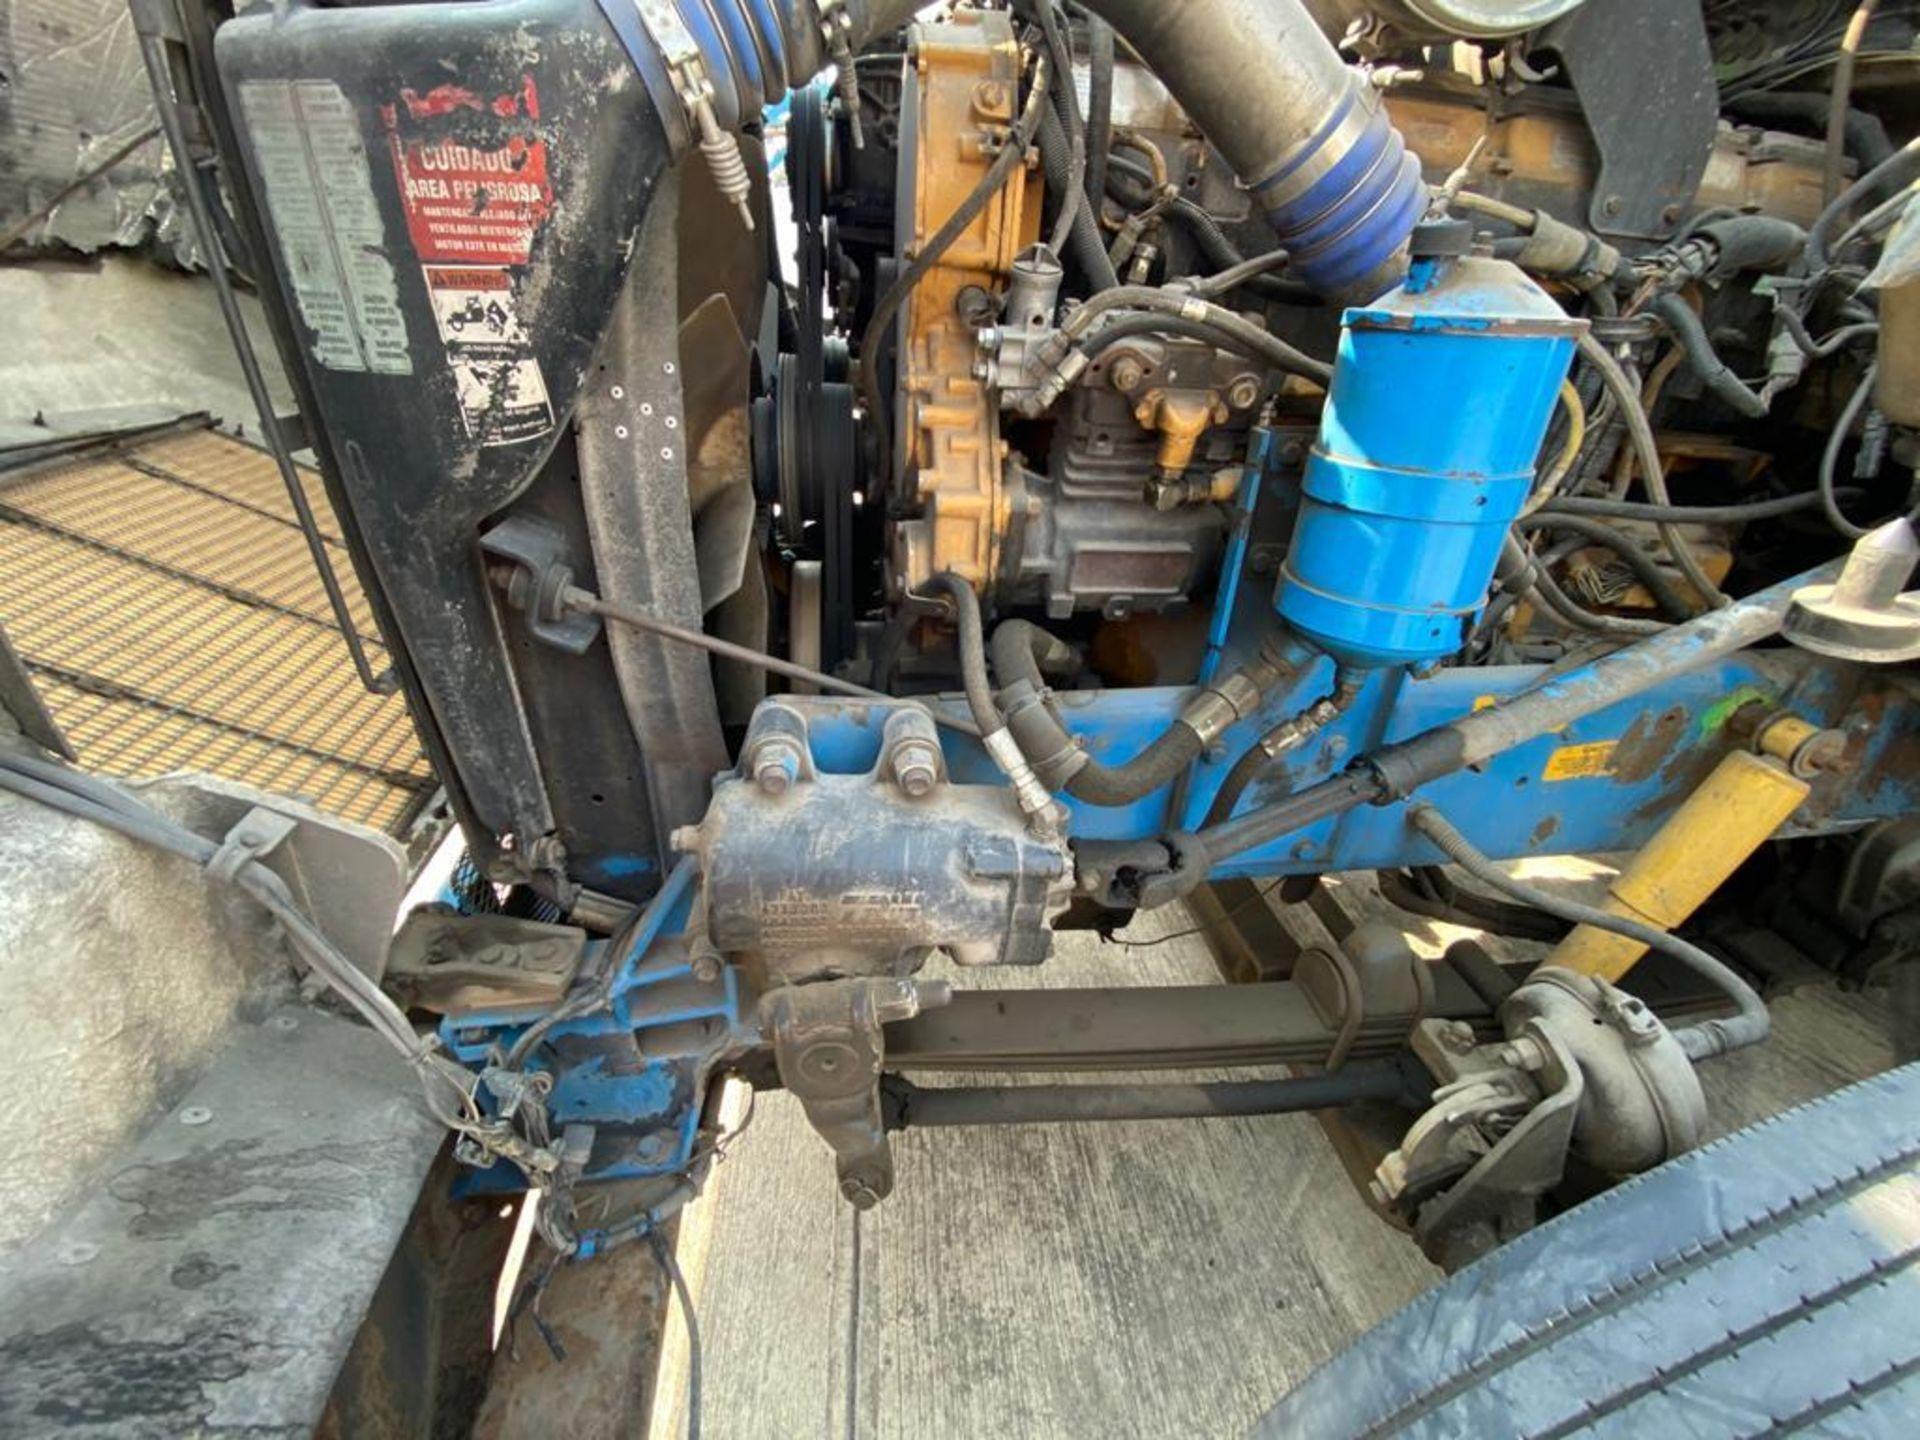 1998 Kenworth Sleeper truck tractor, standard transmission of 18 speeds - Image 70 of 75